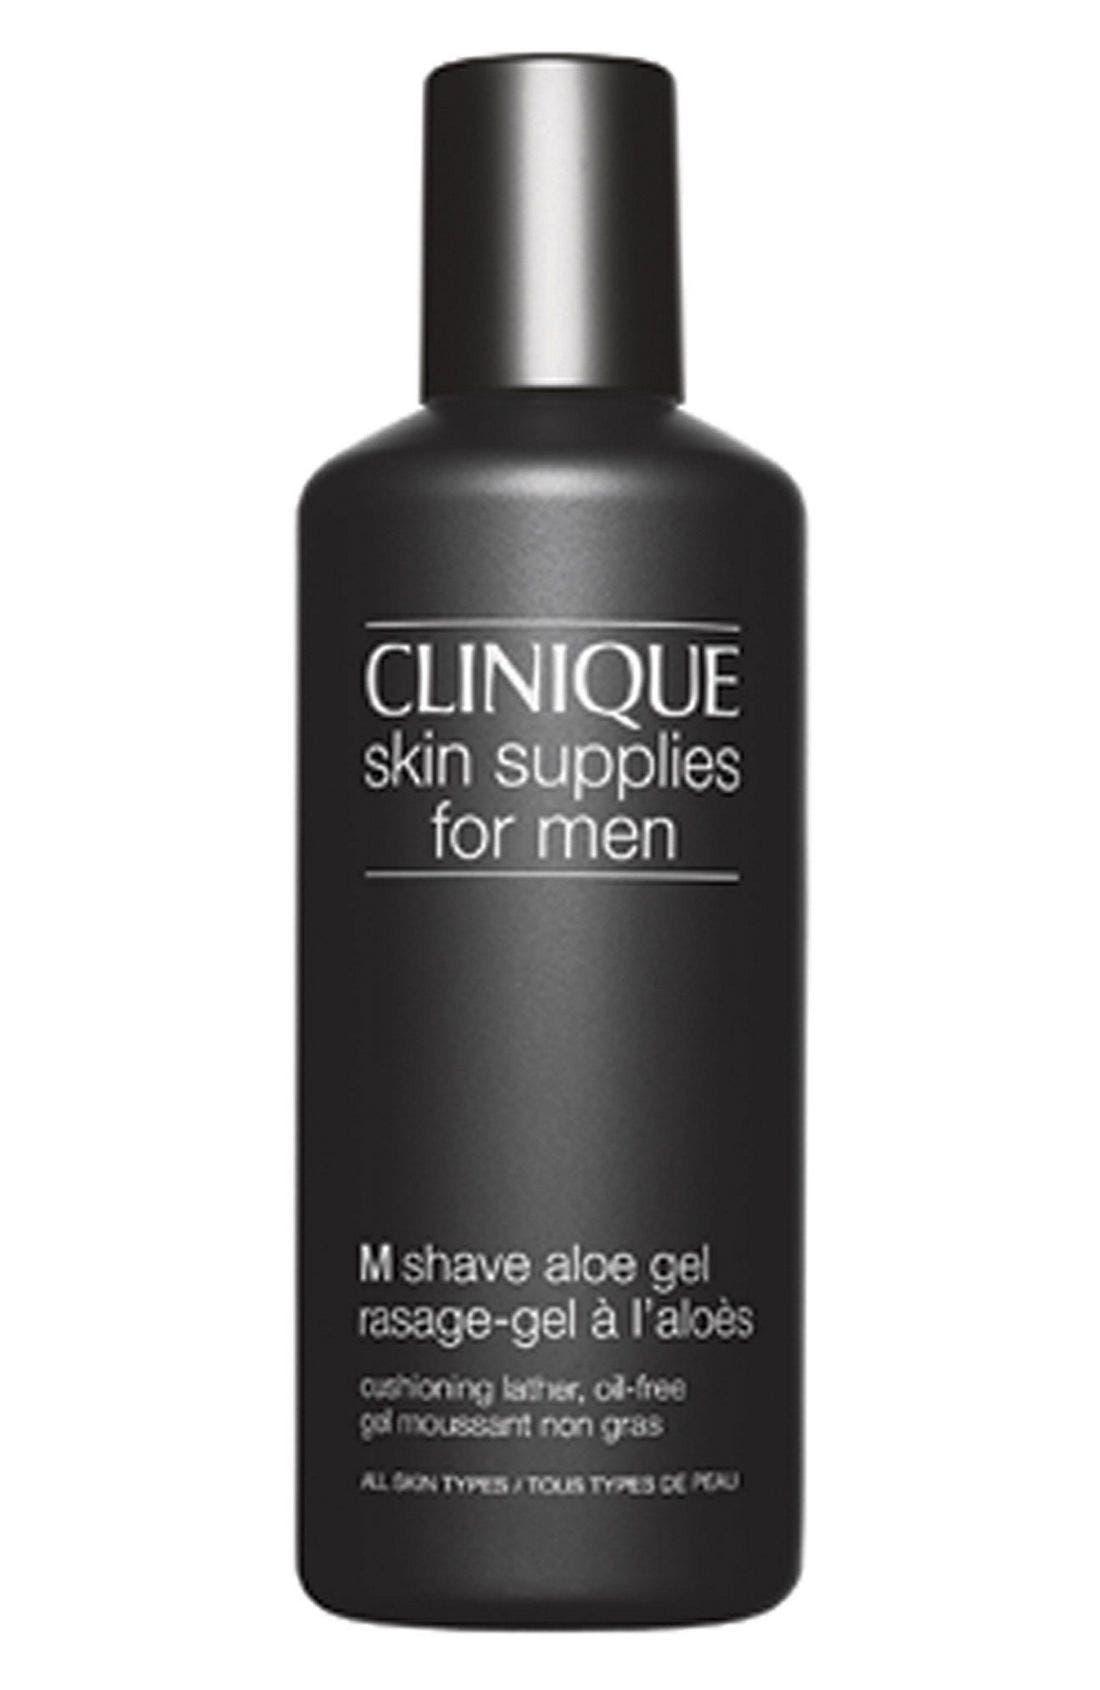 CLINIQUE Skin Supplies for Men M Shave Aloe Gel, Main, color, 000